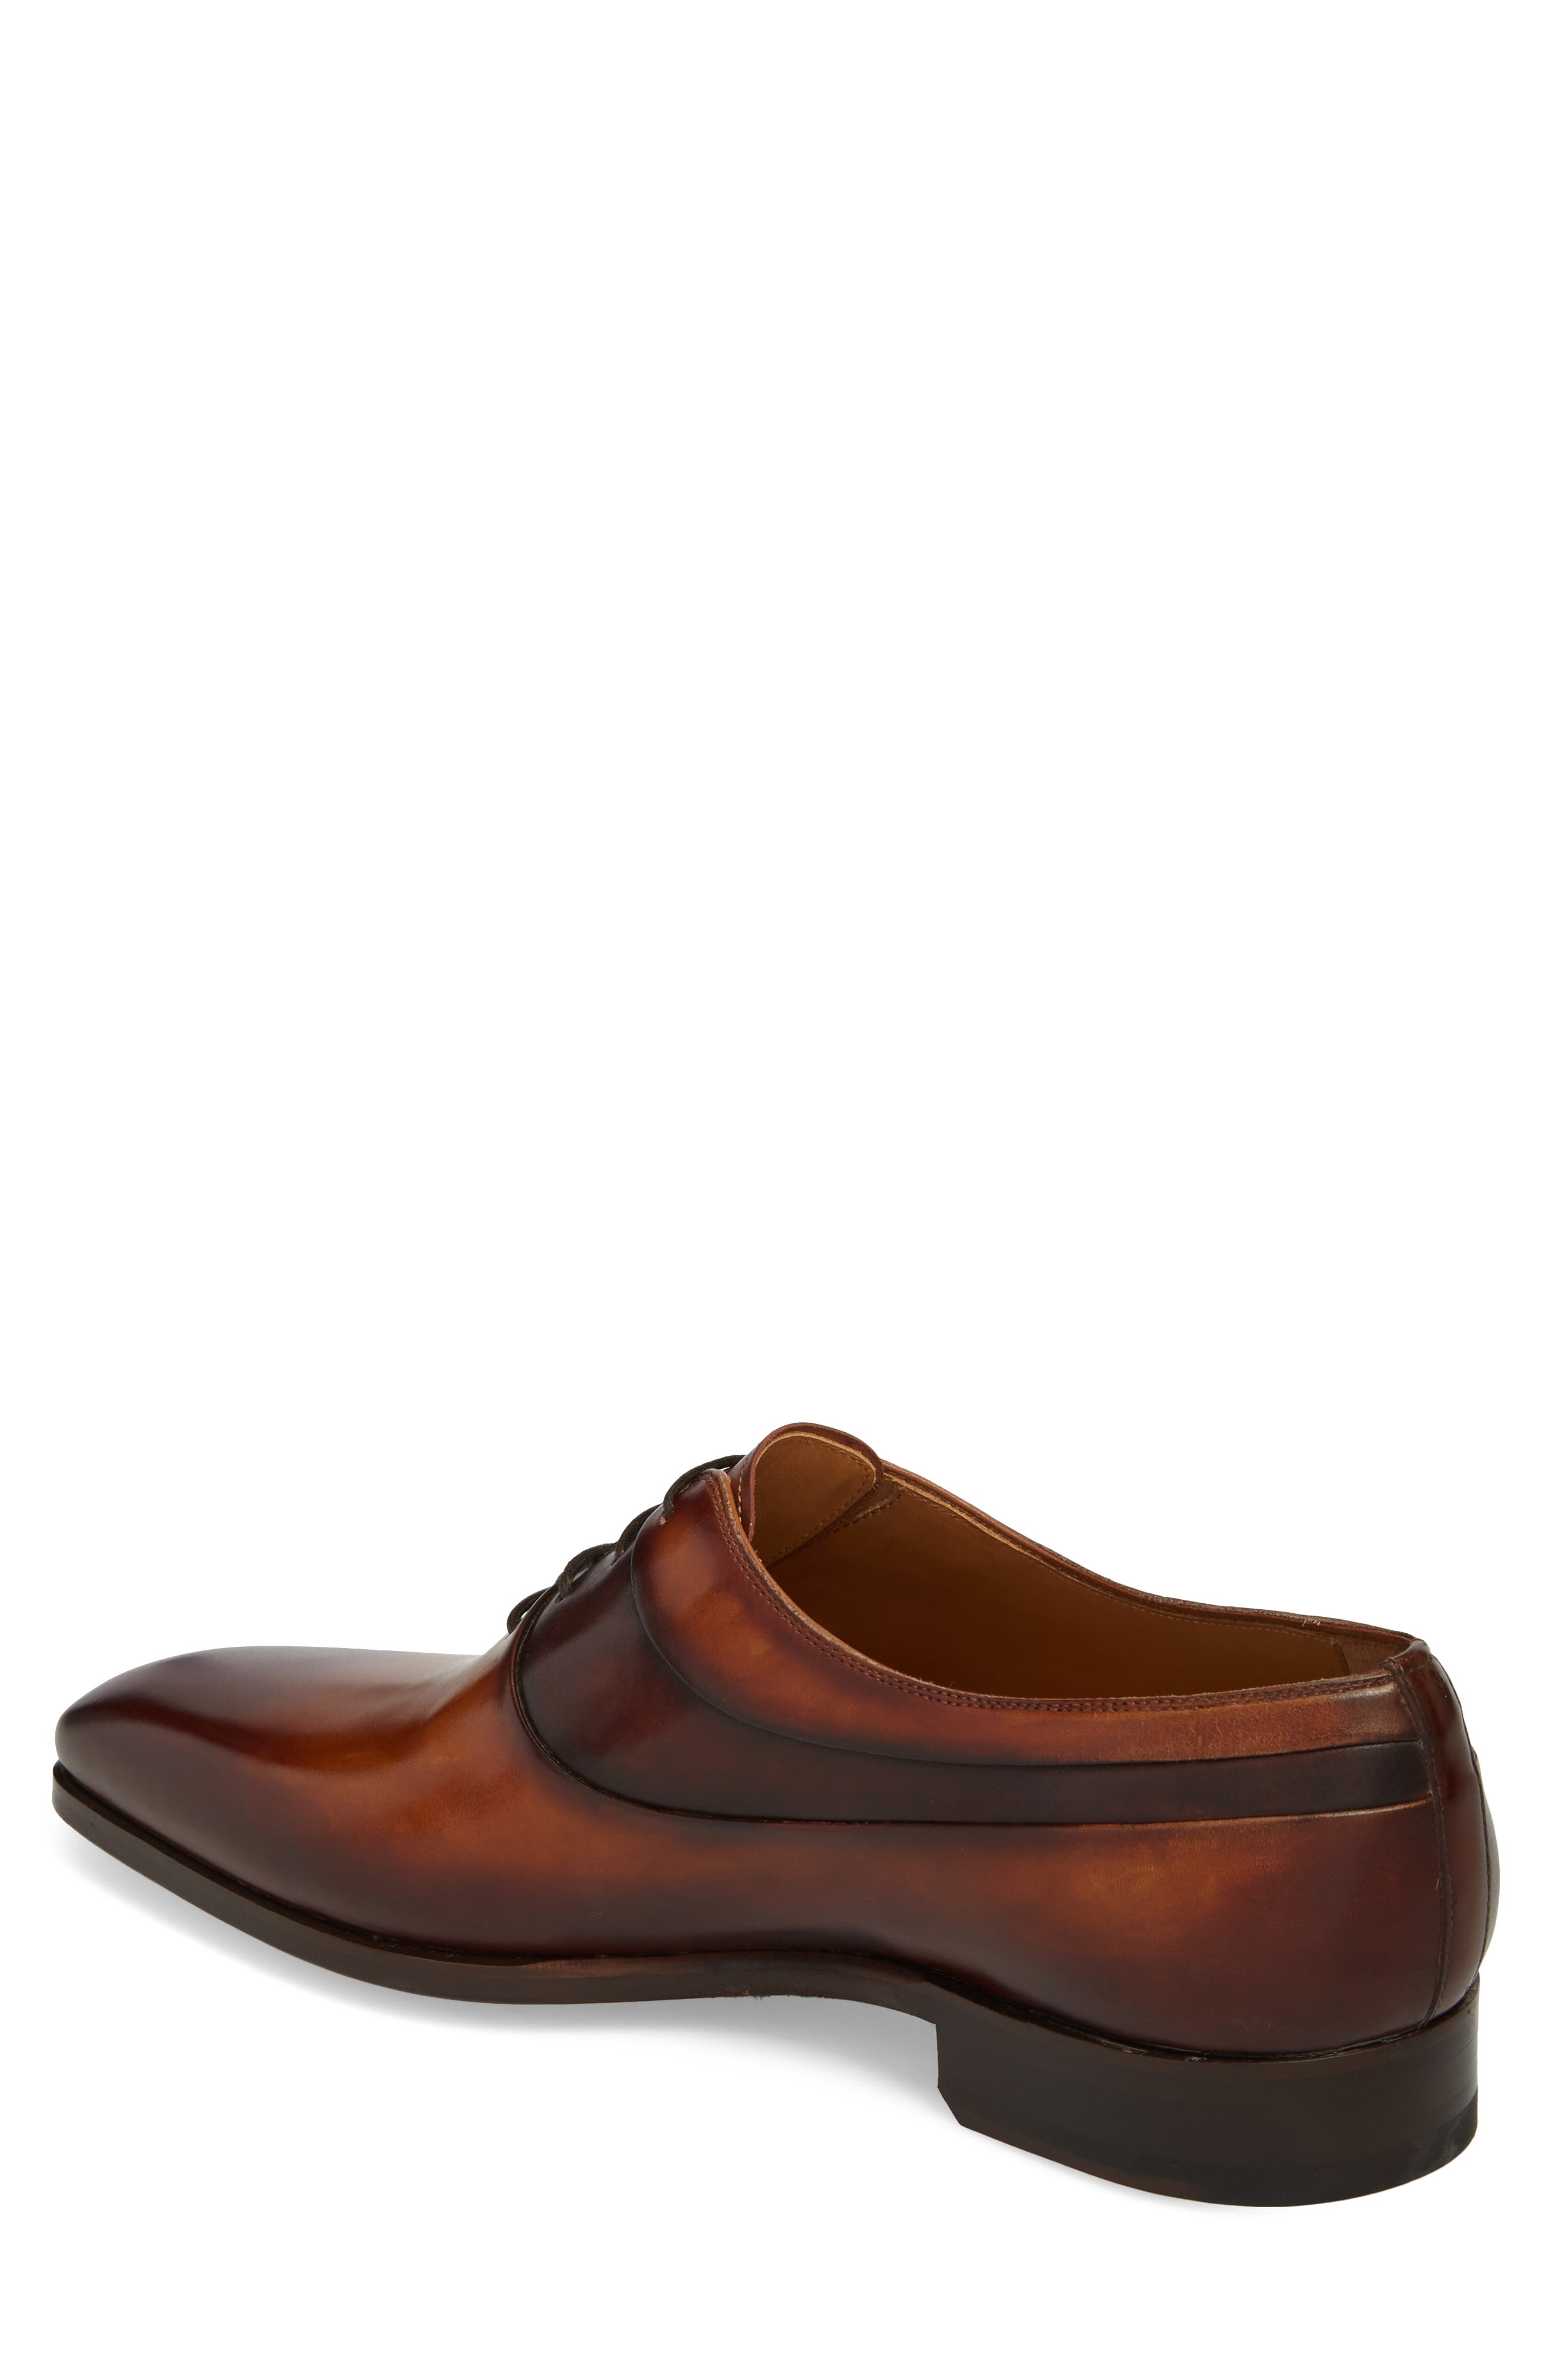 Miles Plain Toe Oxford,                             Alternate thumbnail 2, color,                             Brown Leather